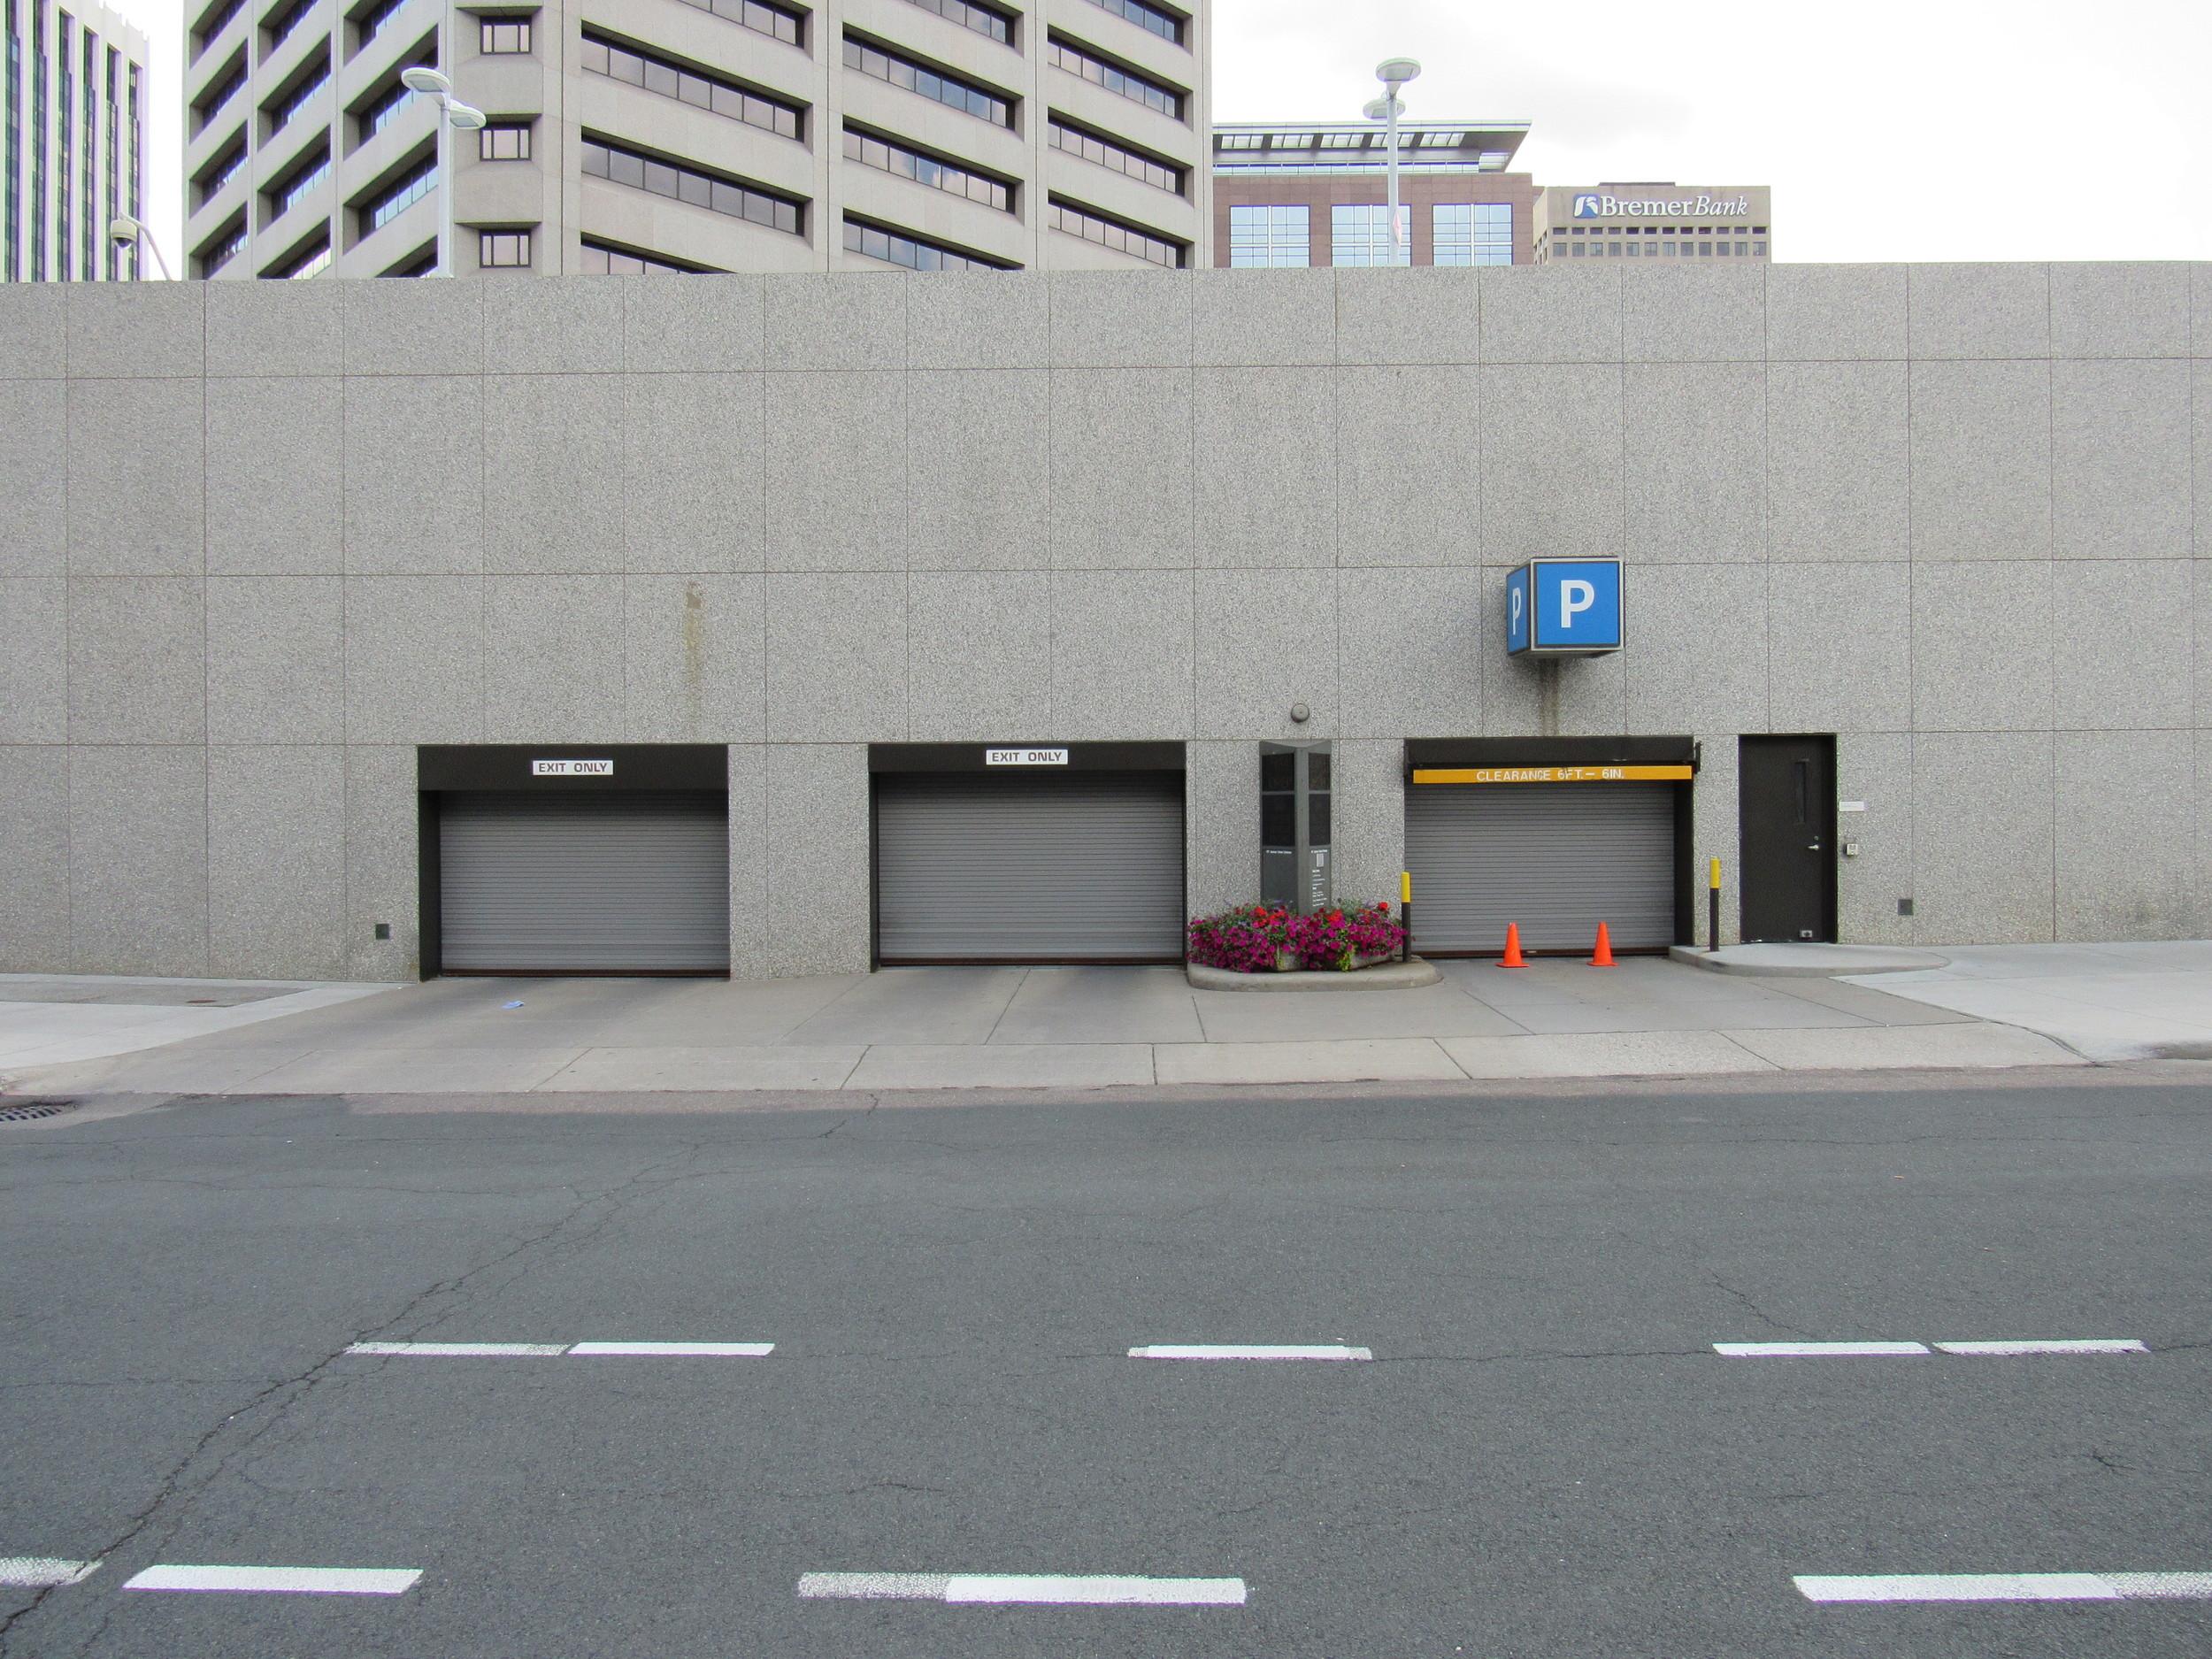 Downtown St. Paul parking structure